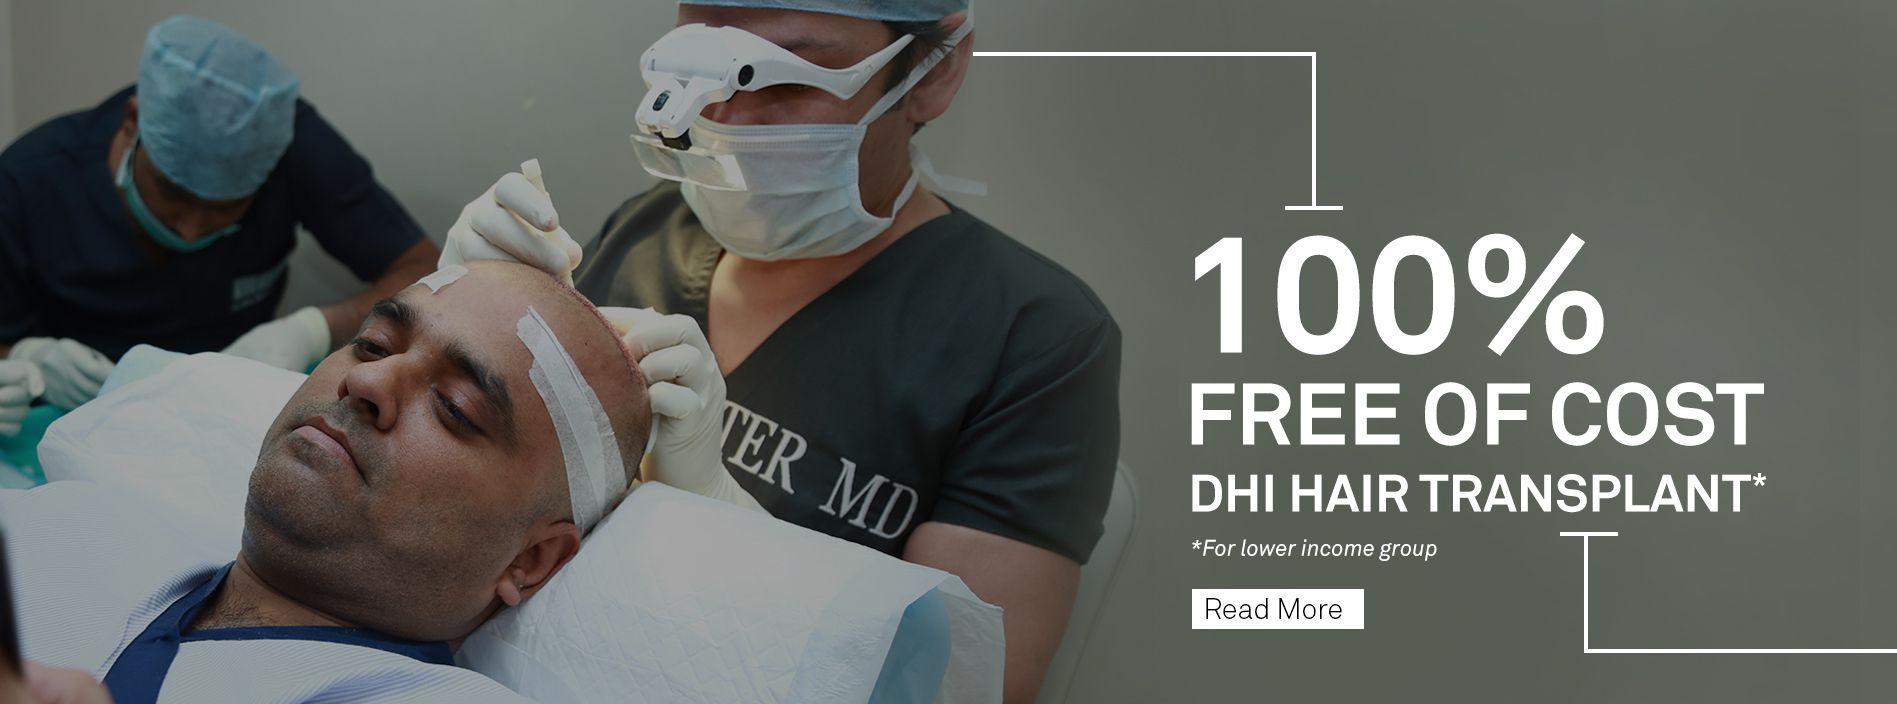 dhi hair transplant clinics map